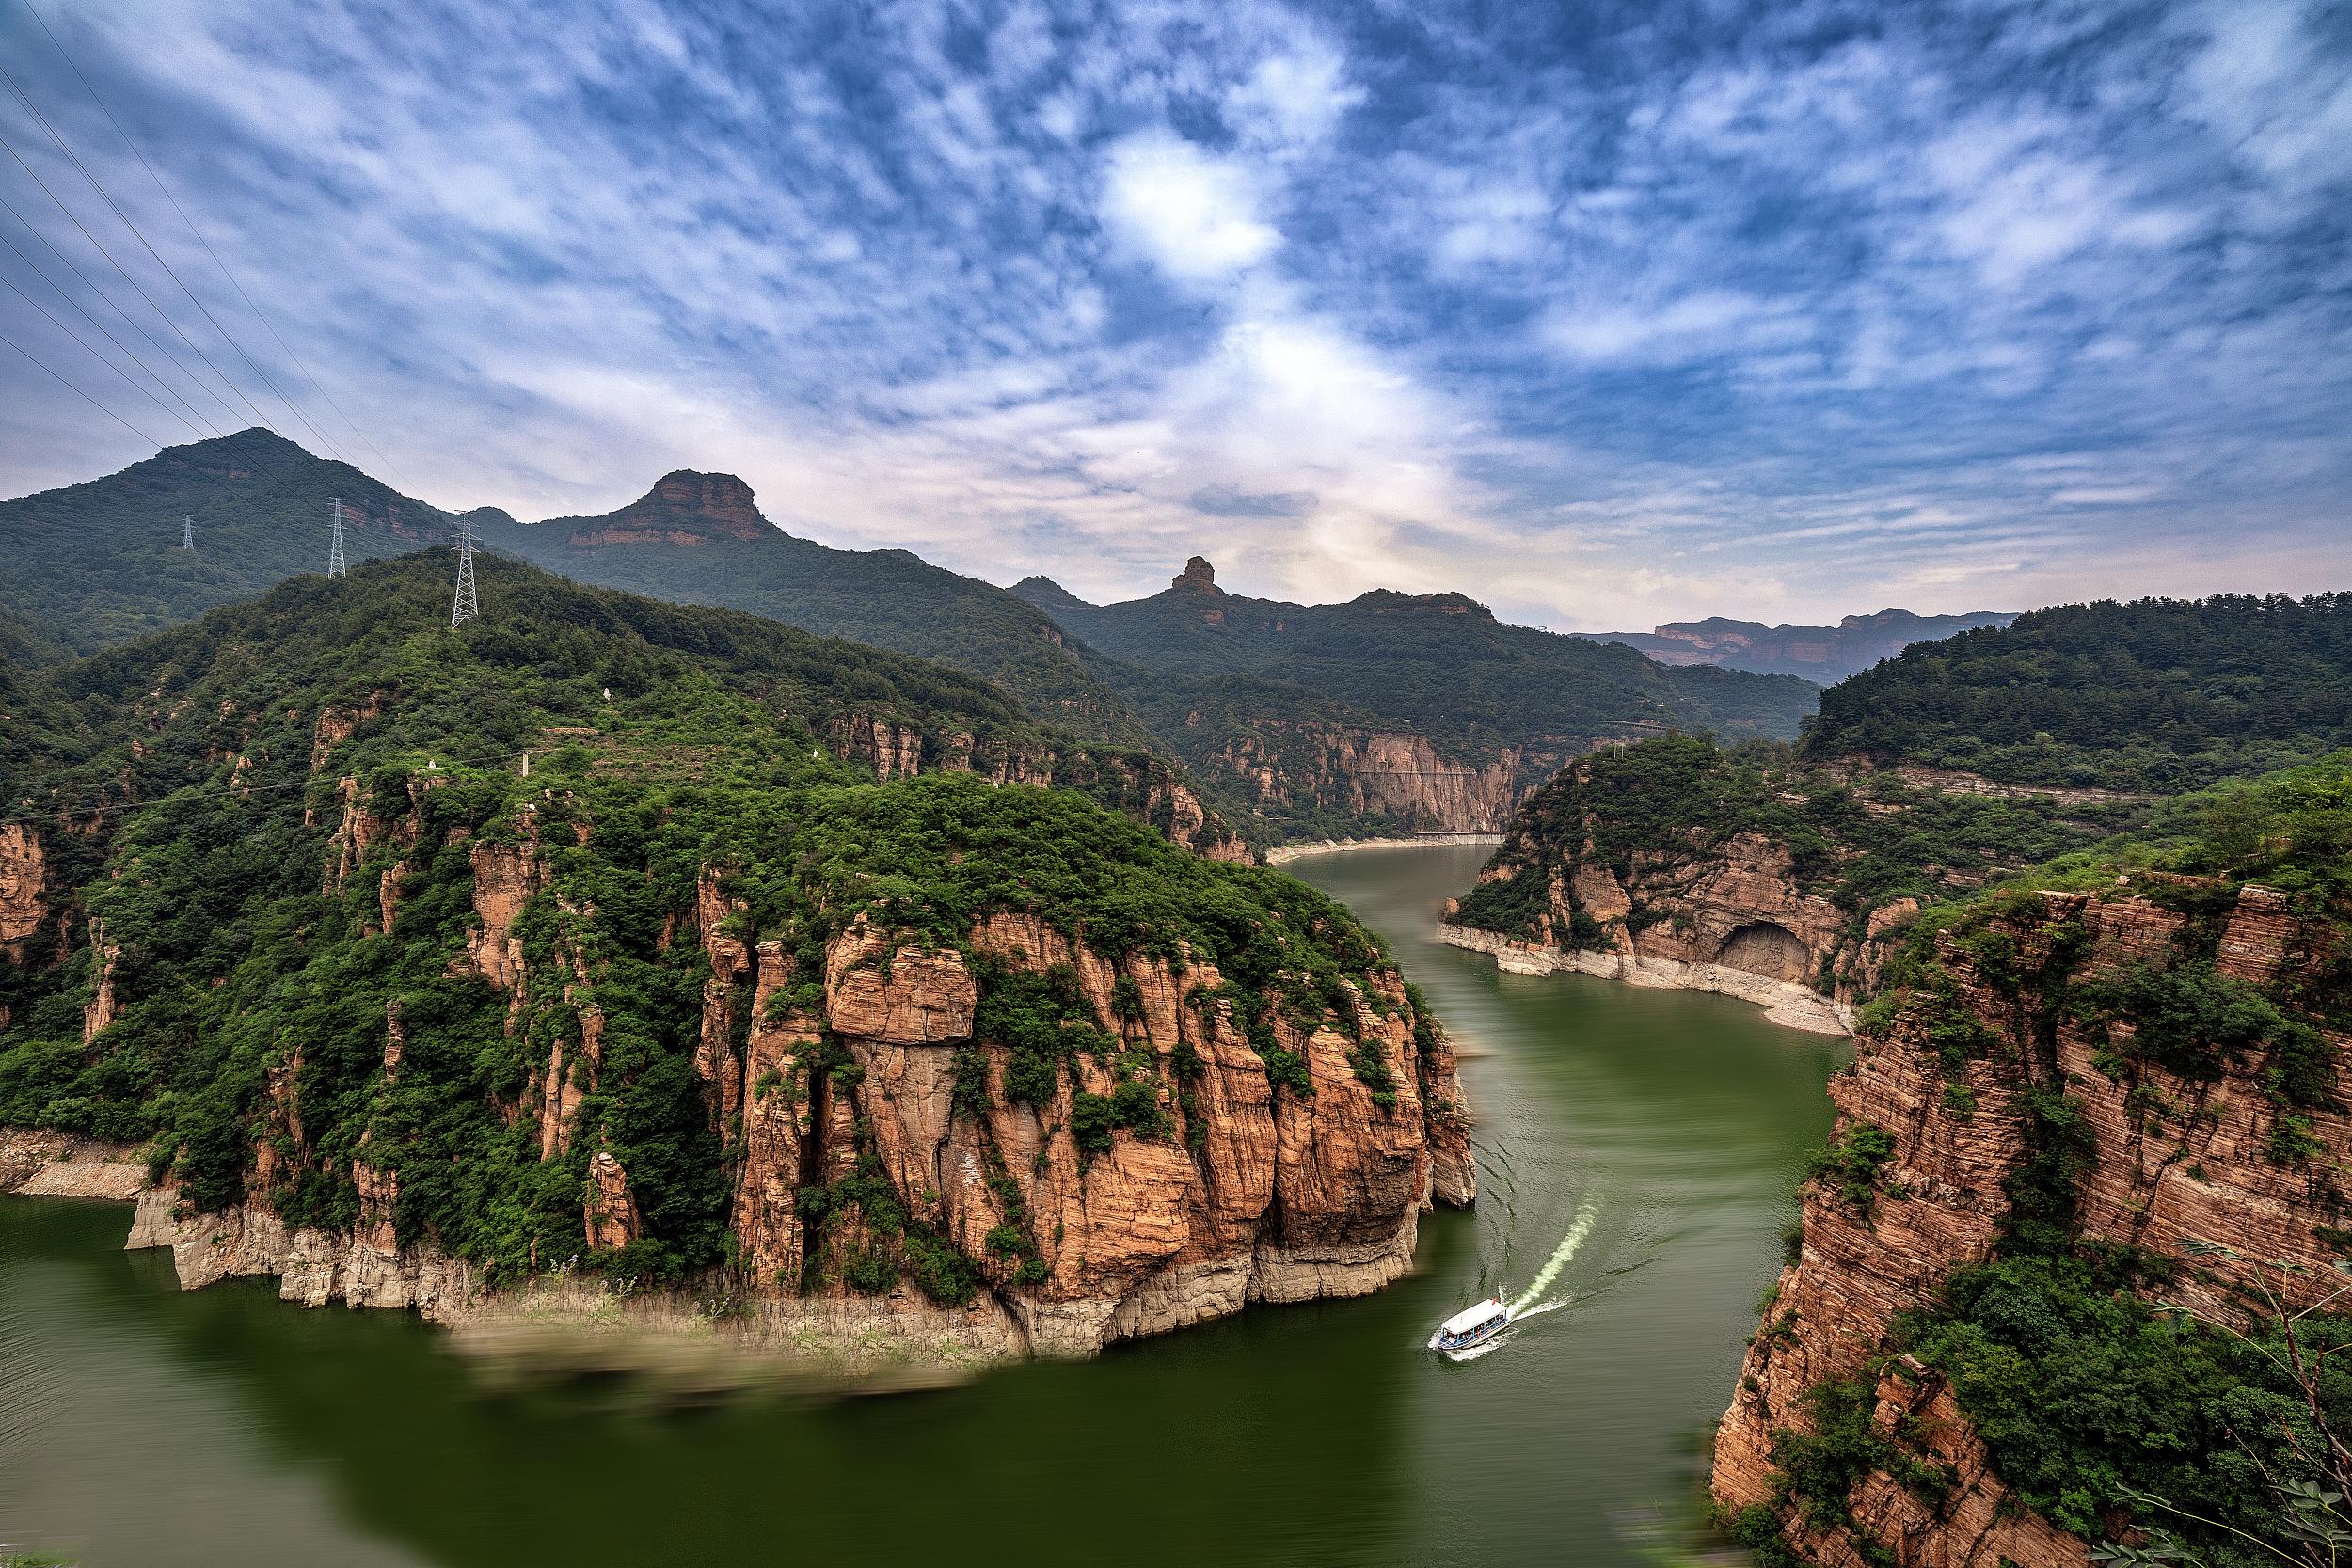 Jingniang Lake